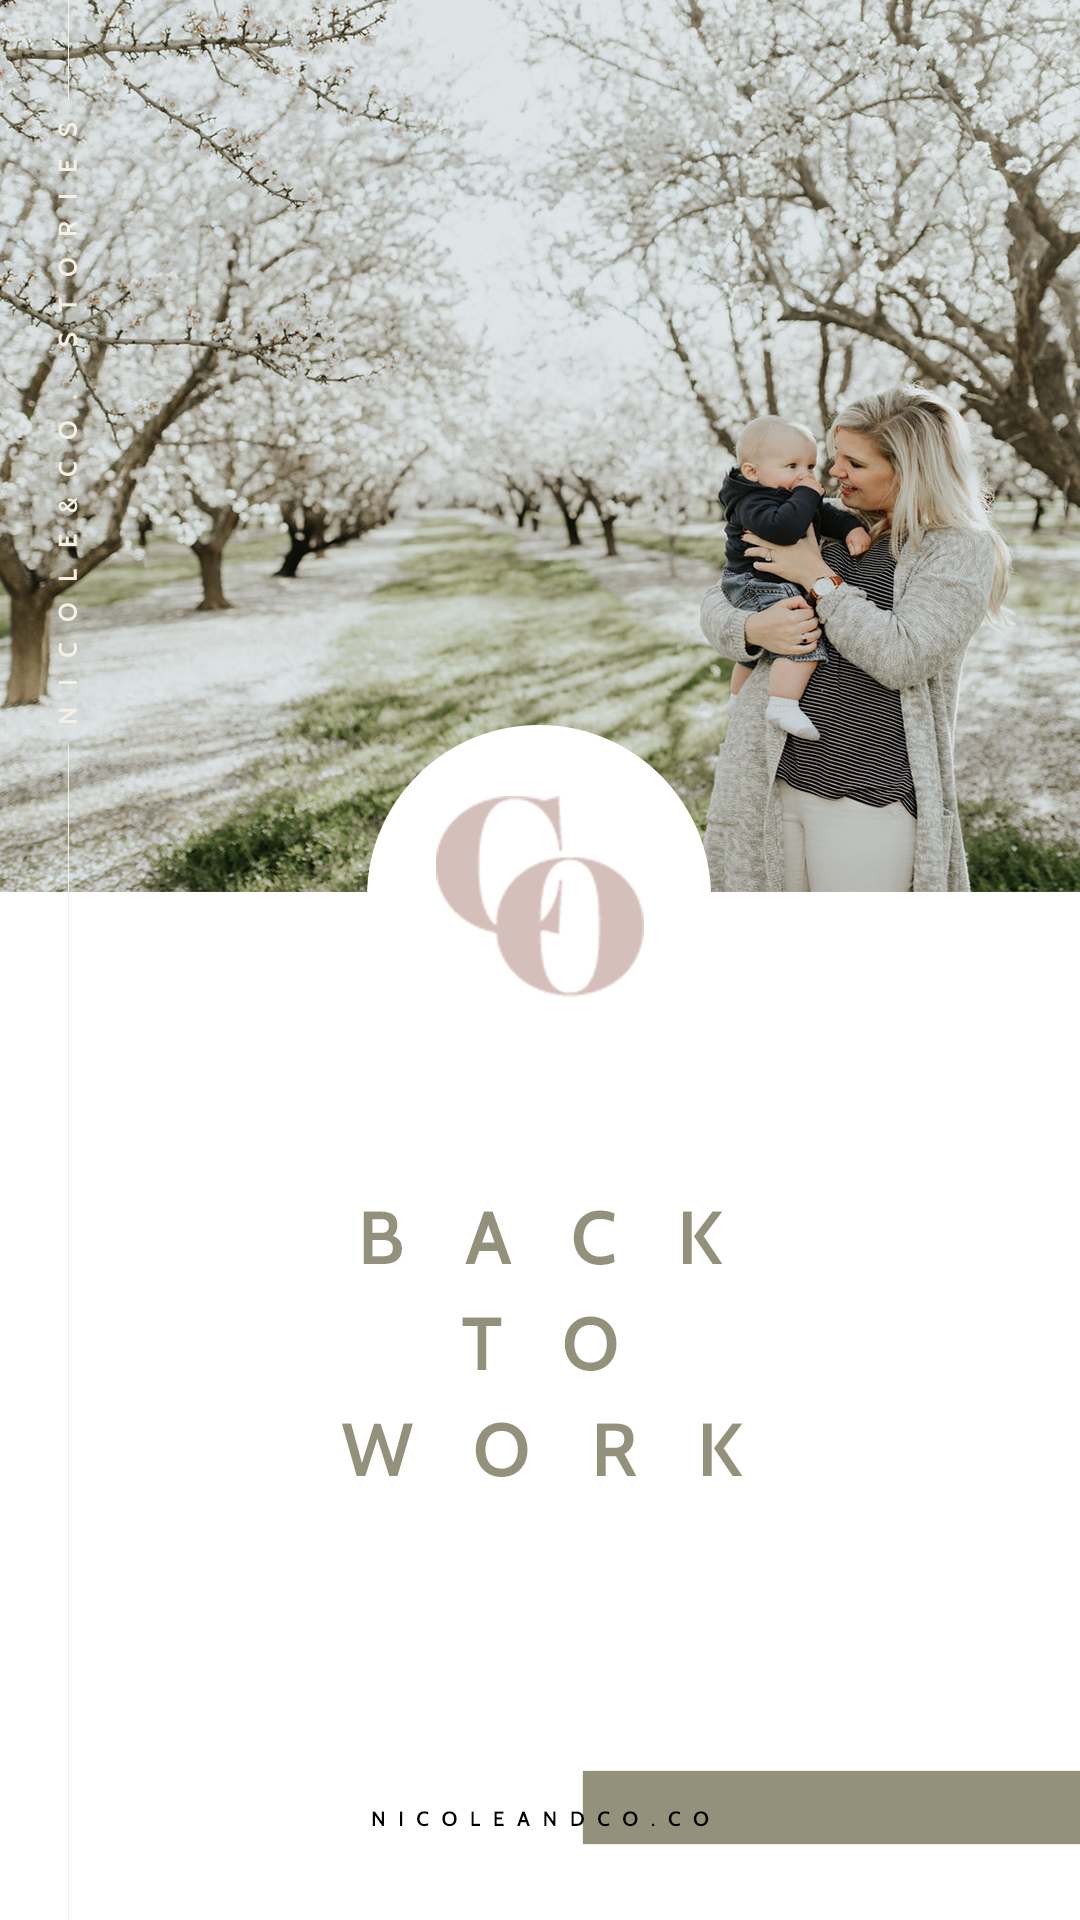 Backtowork.jpg